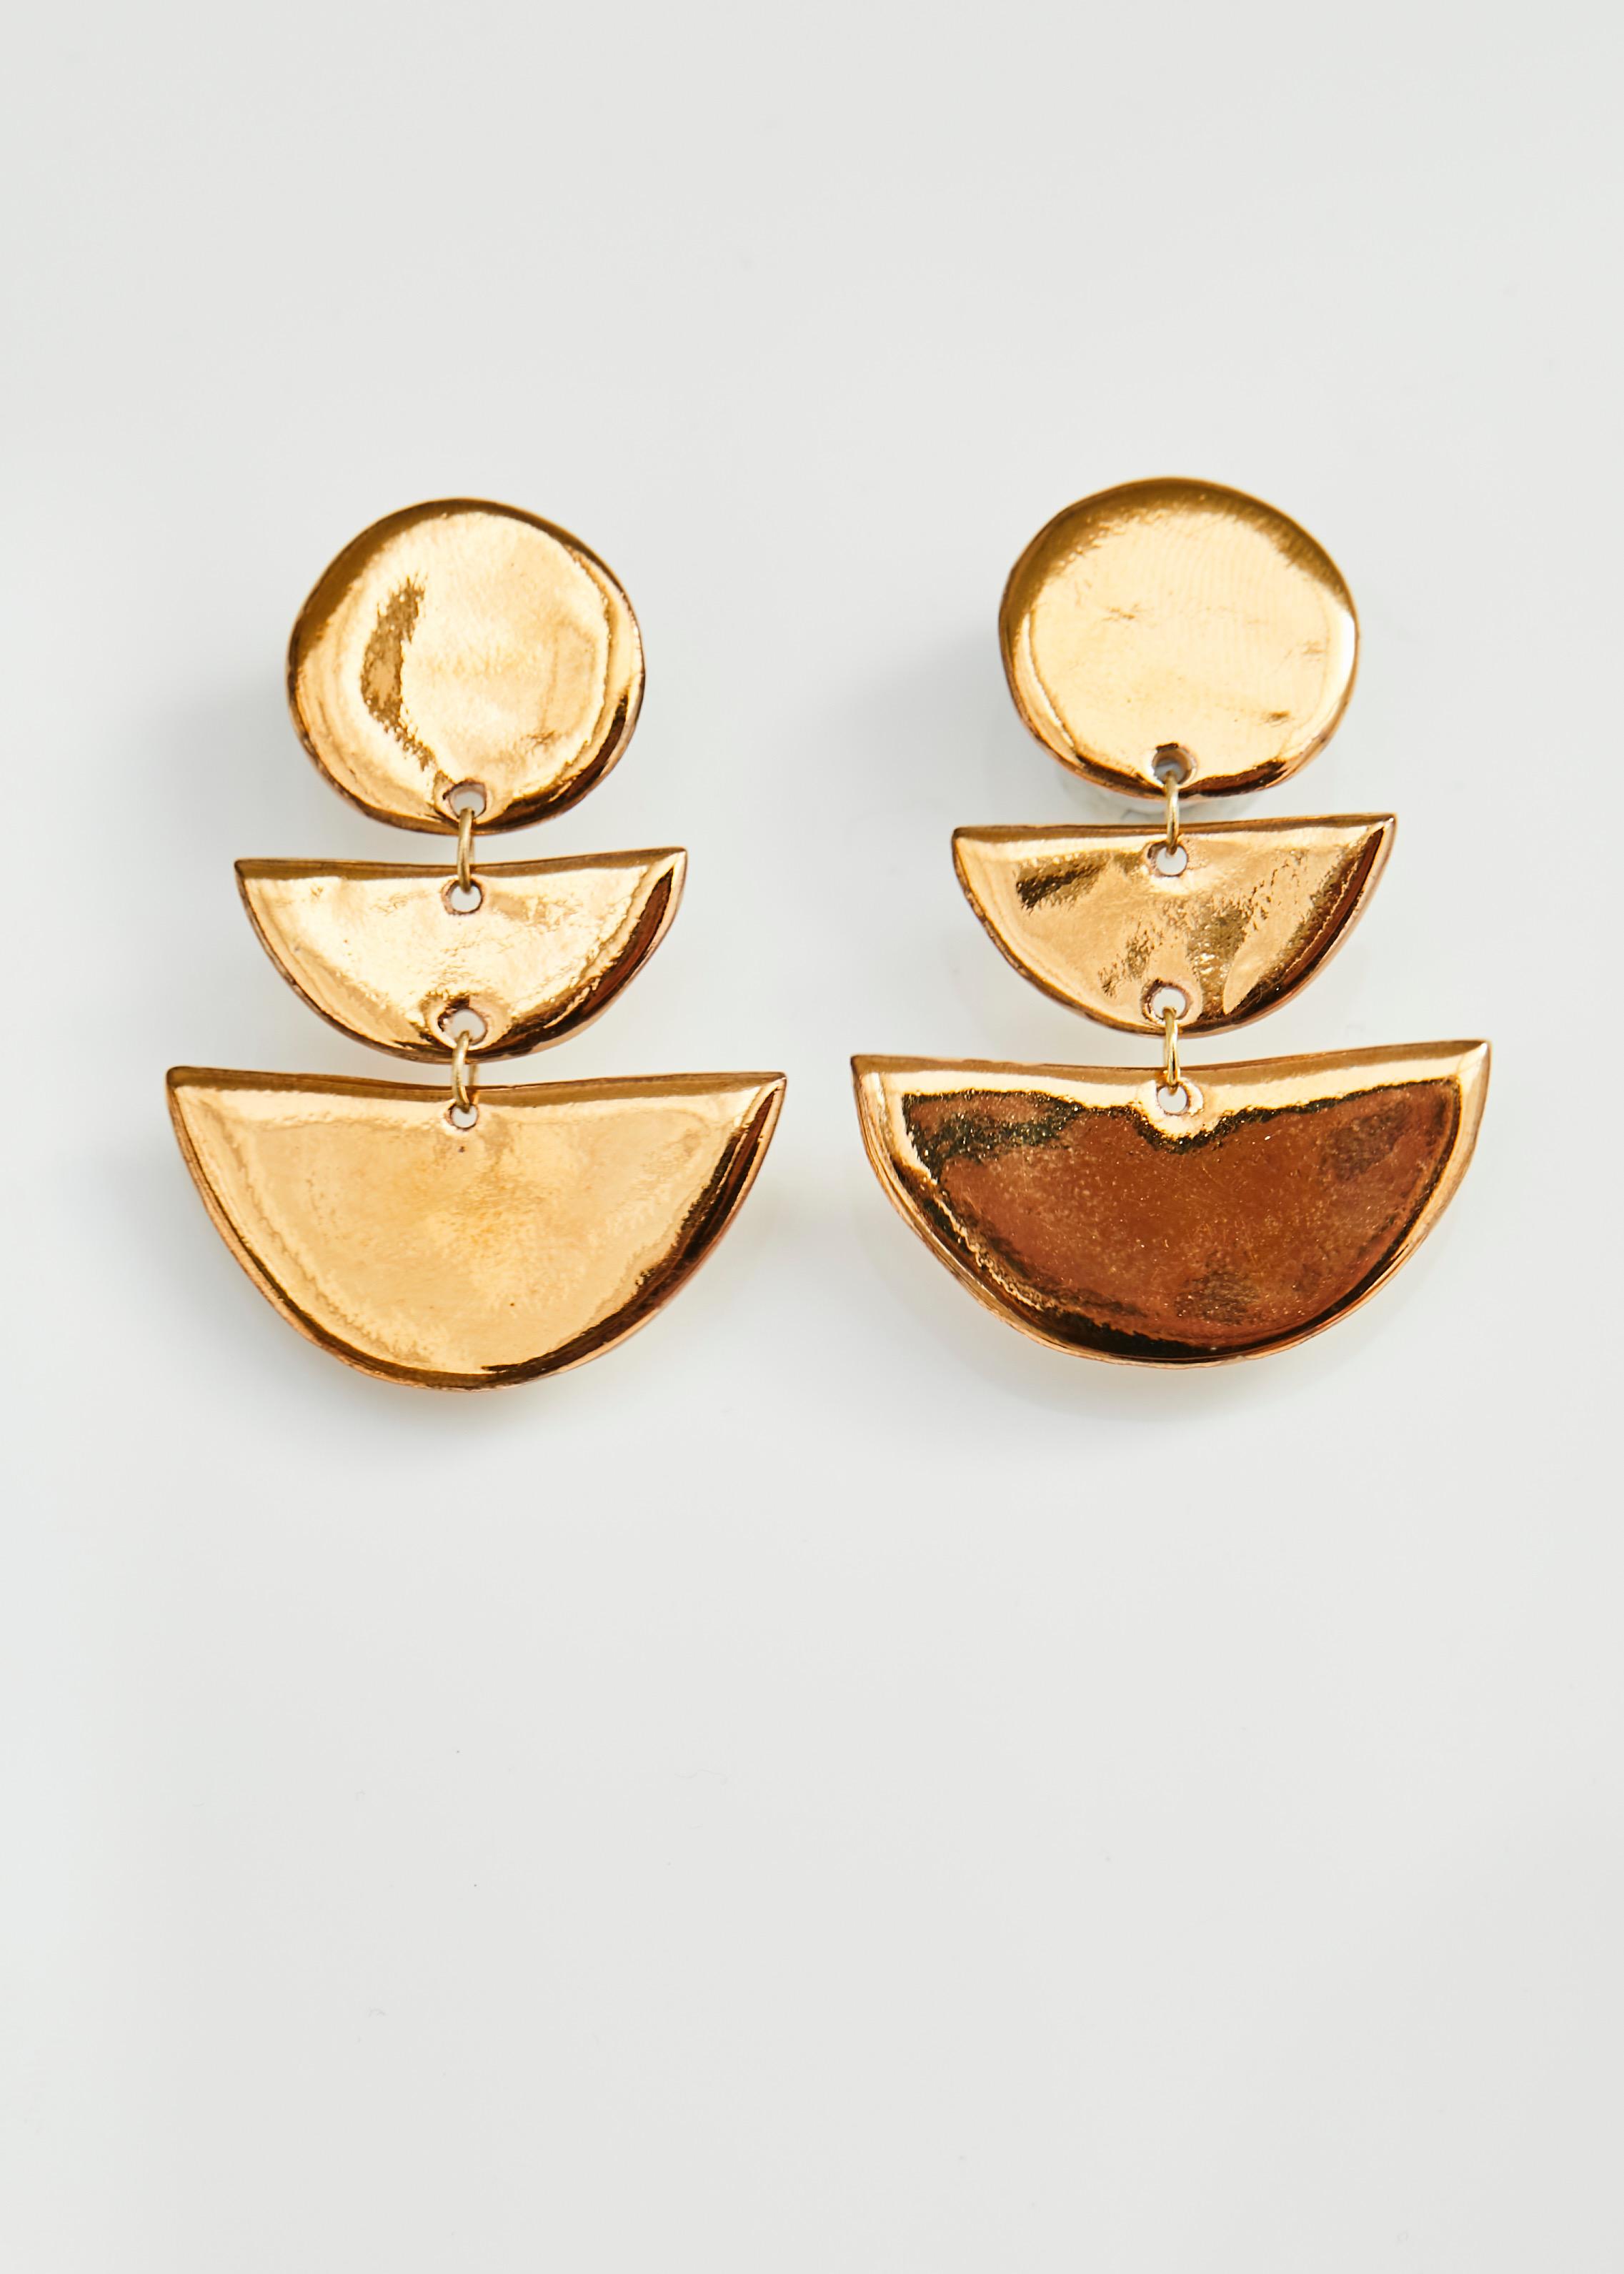 chandalier yellow gold 1.JPG